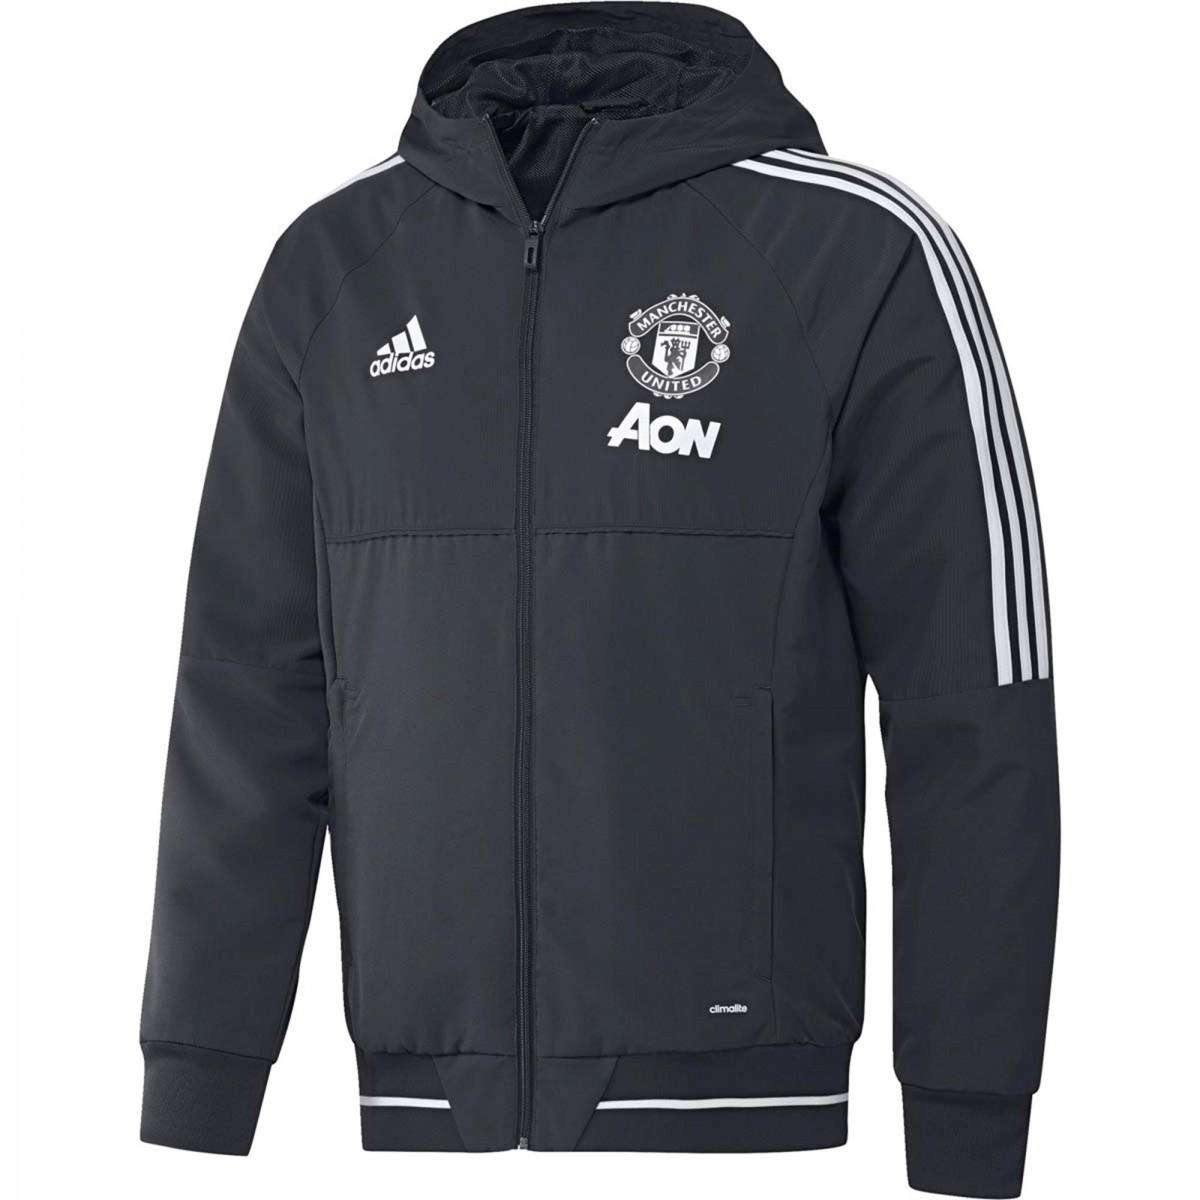 Veste de football adidas performance Manchester United FC